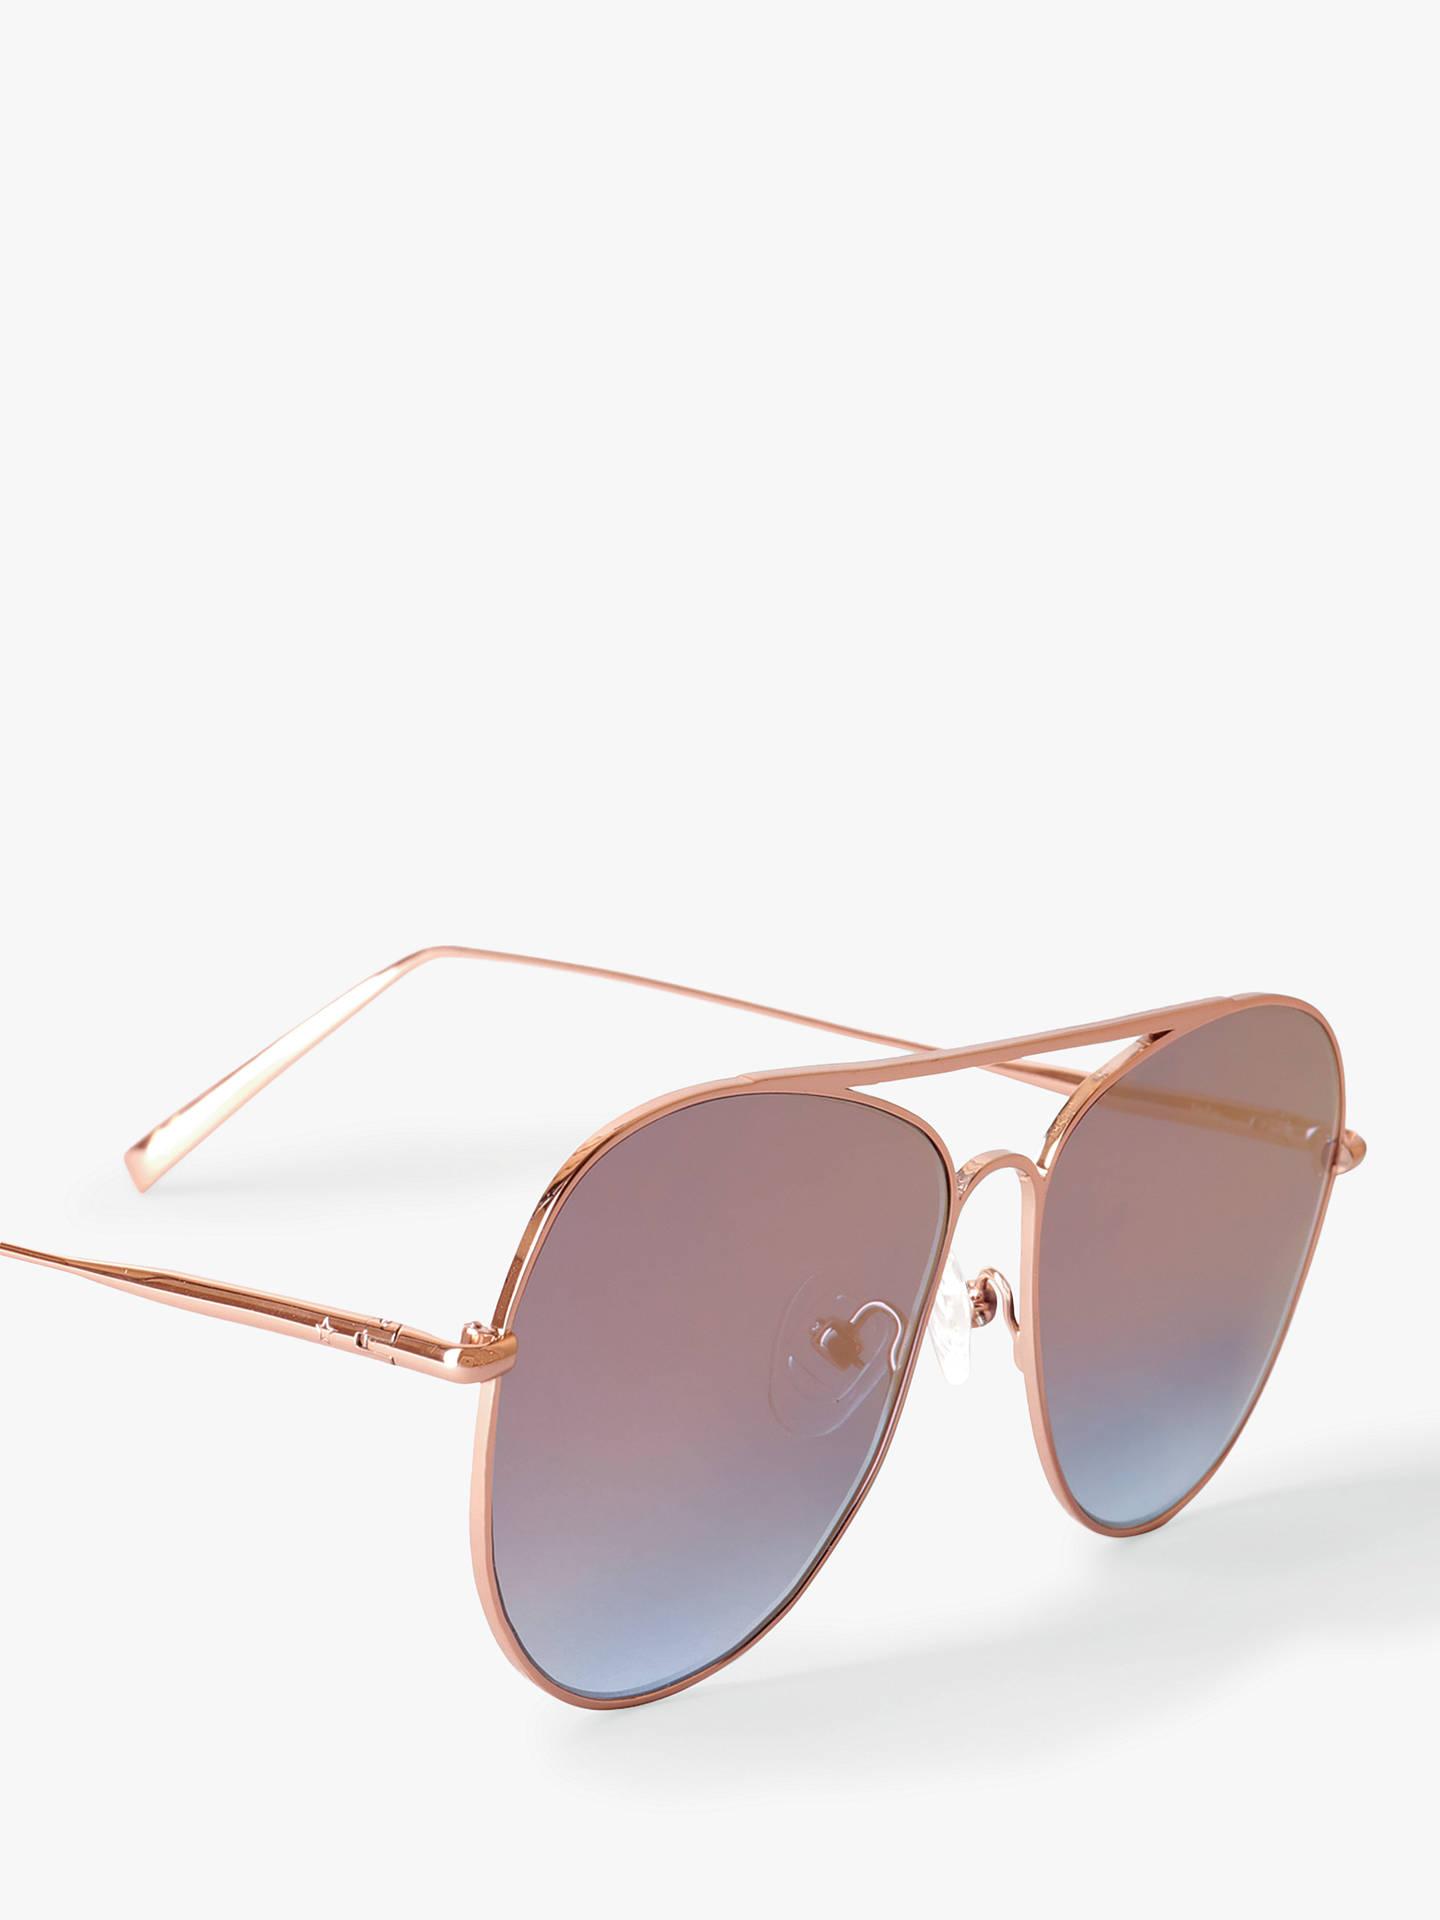 52515b889a ... Buy hush Women s Isla Aviator Sunglasses